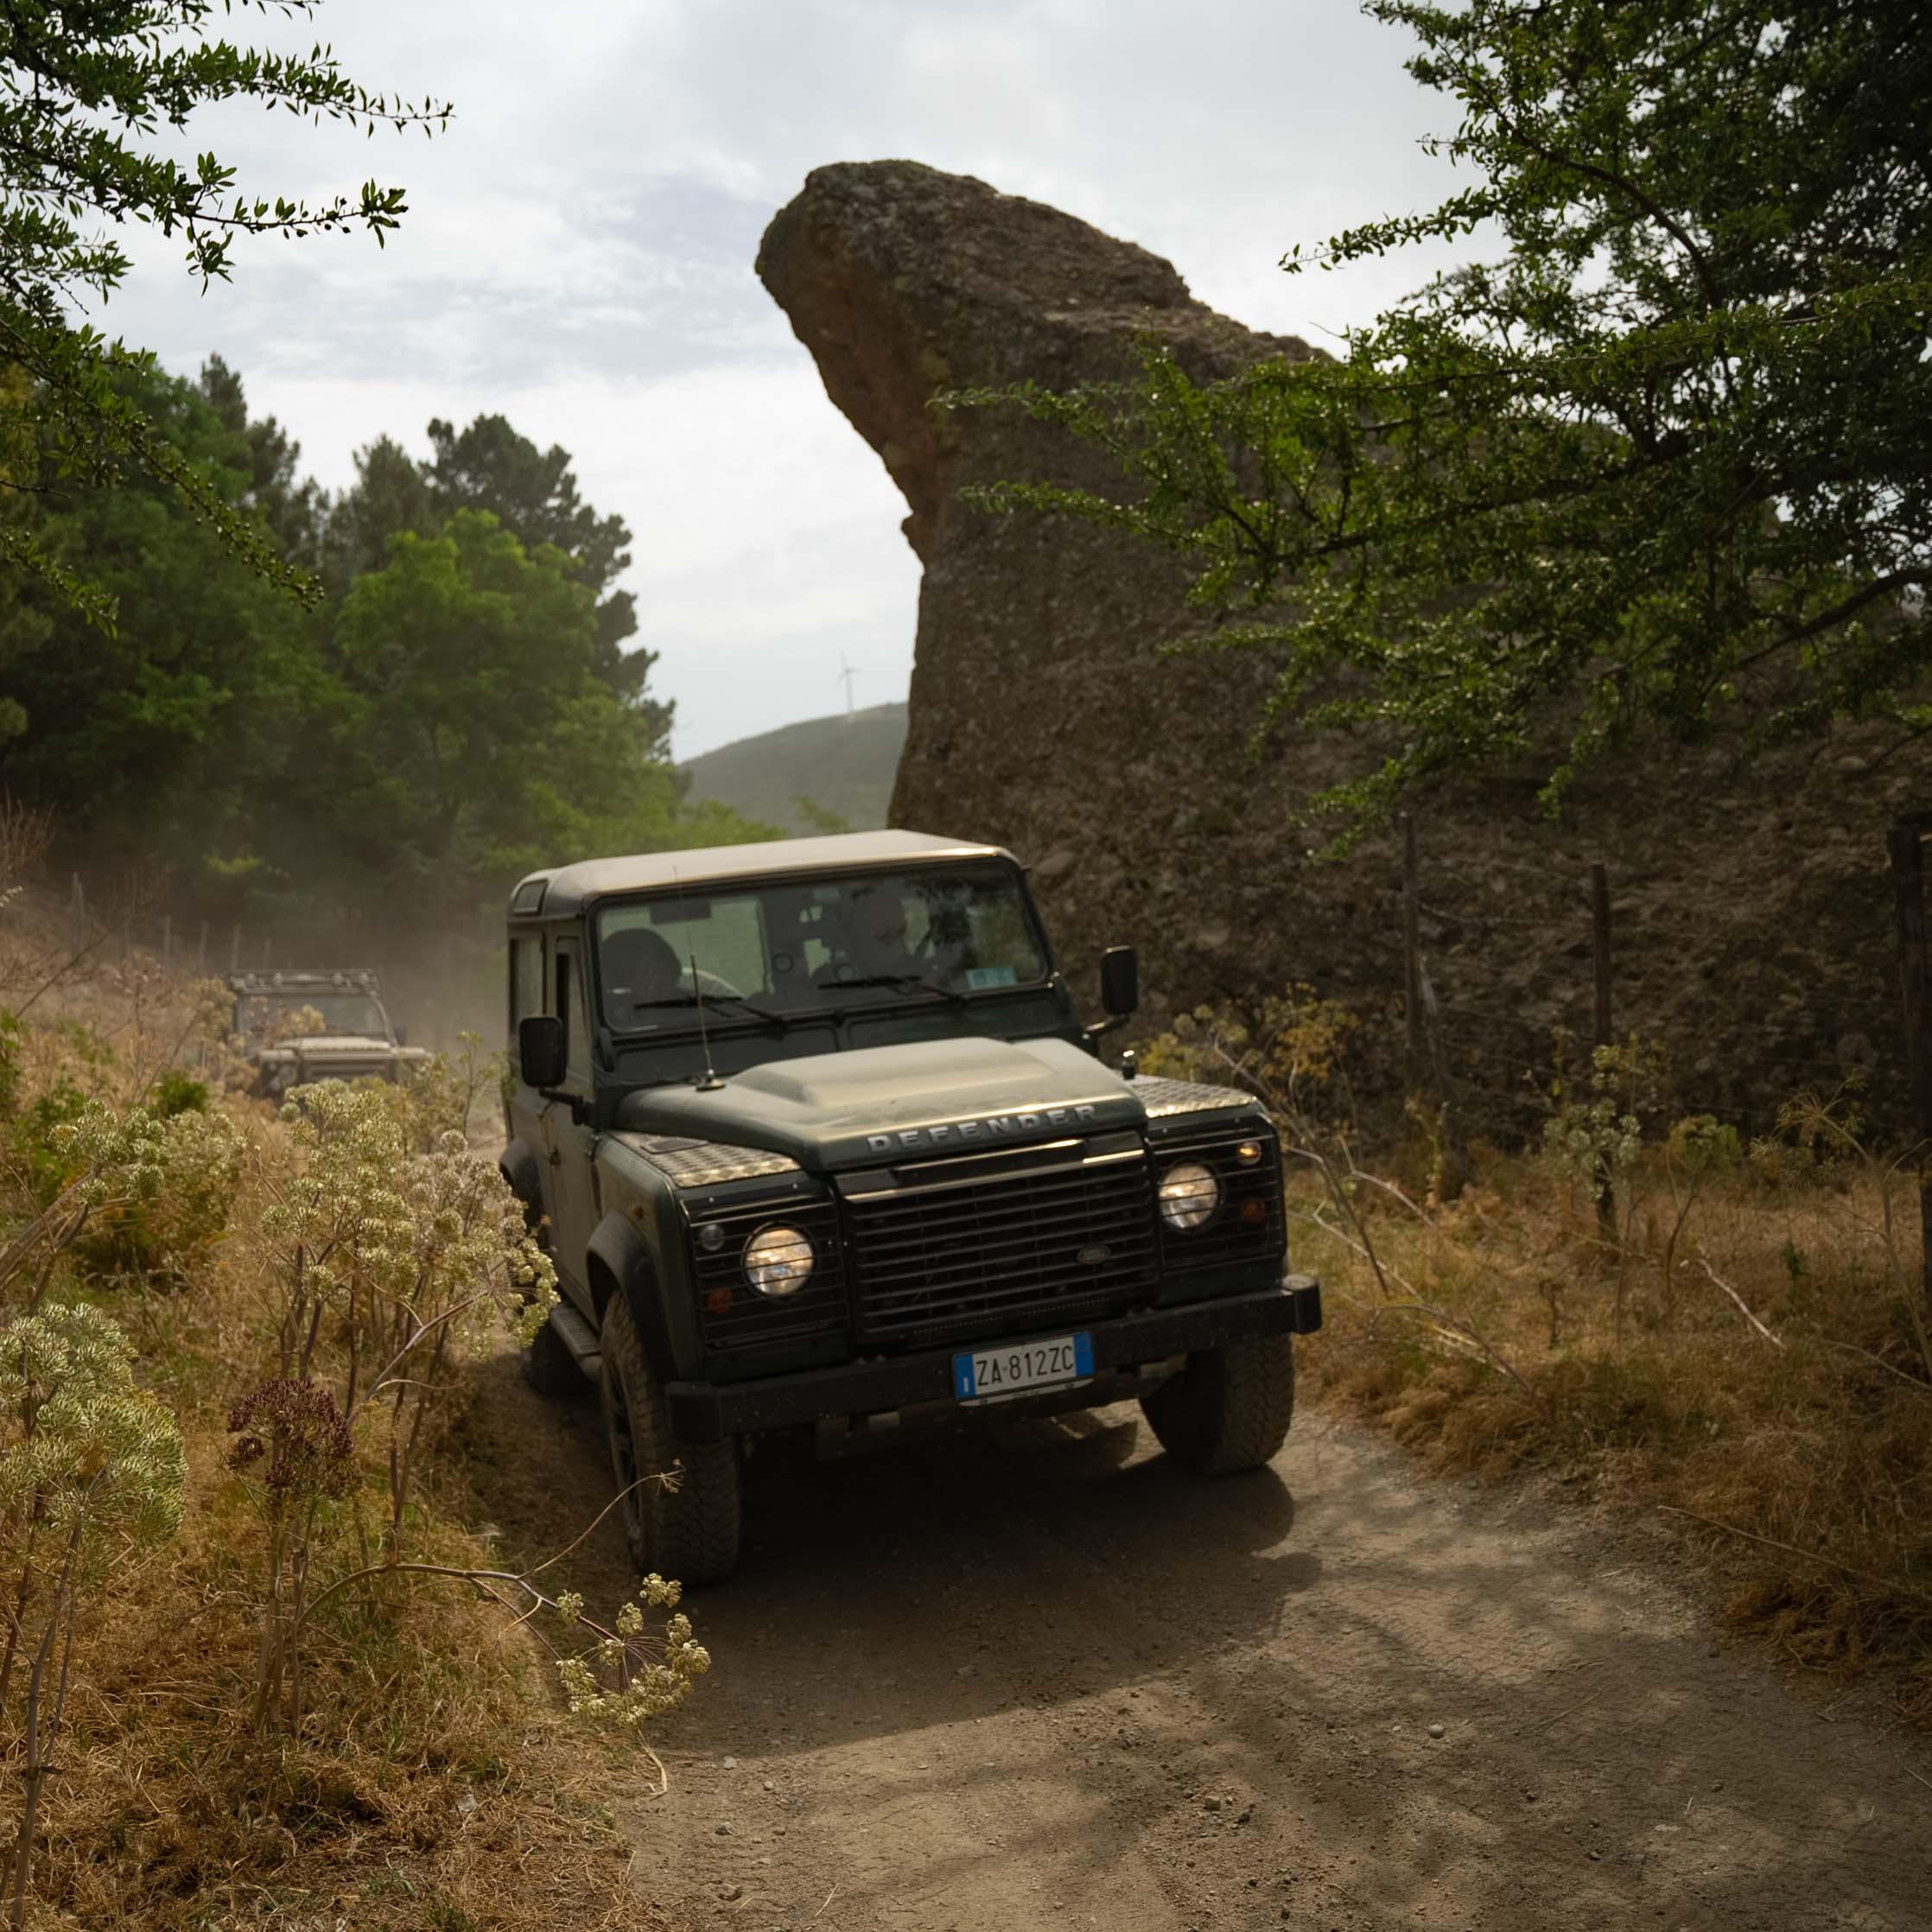 Land_Rover_Tour_Sicilia_2021_Land_Rover_Experience_Italia_-15